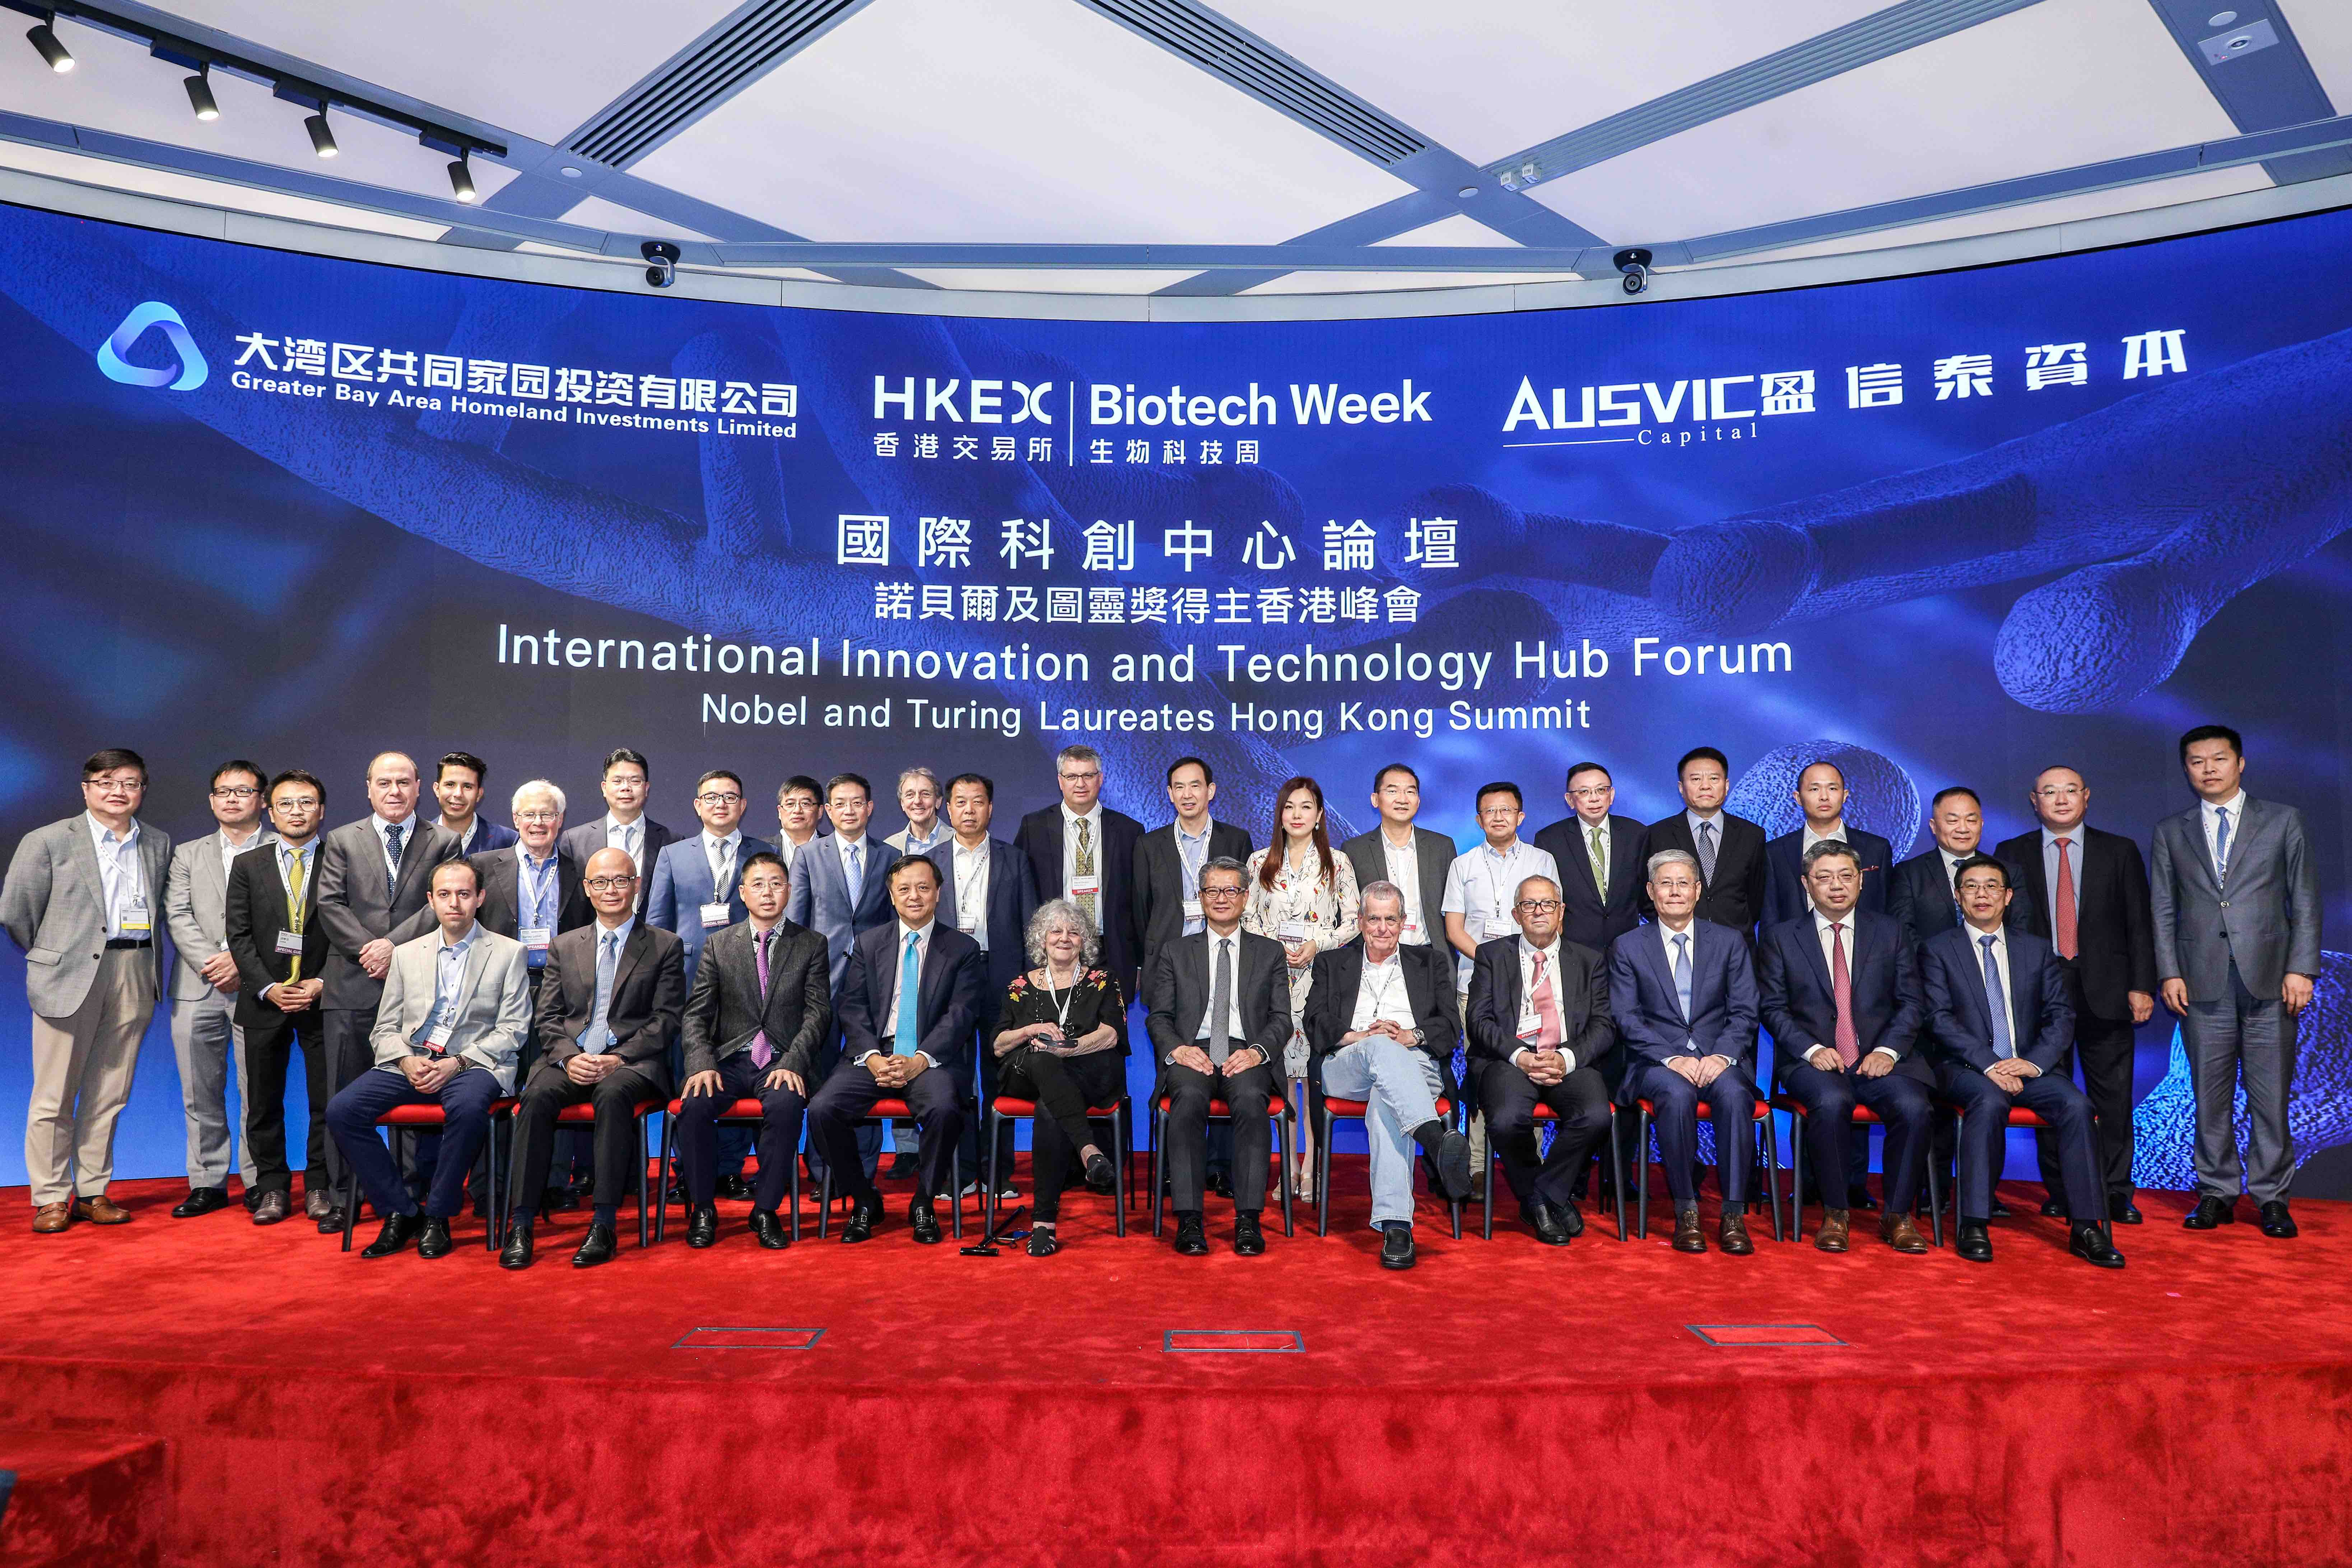 HKEX Biotech Week 2019